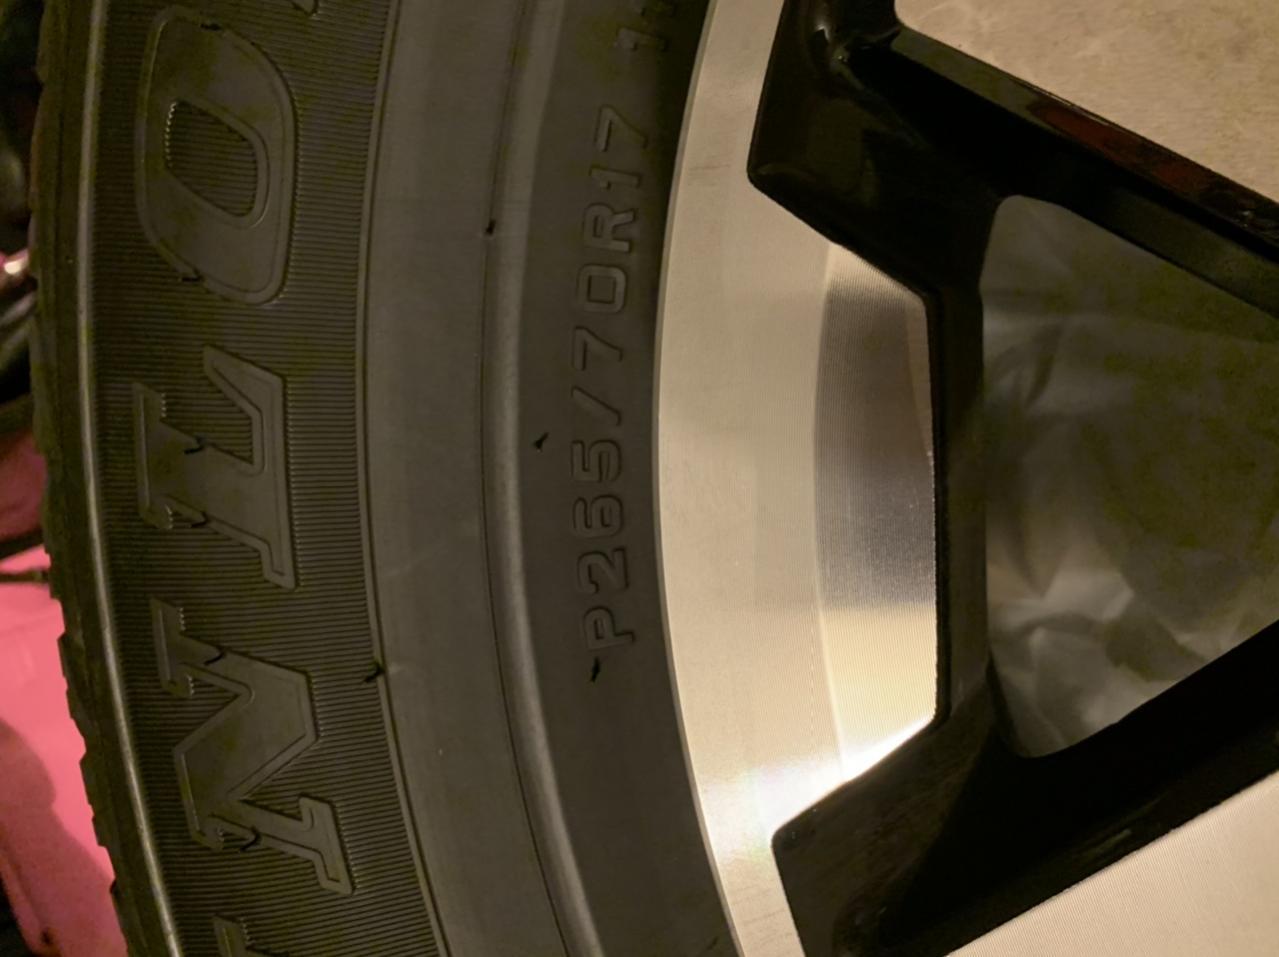 FS: 5th Gen Wheel/Rims & Tires - 00 [Central Pennsylvania]-9e7705af-ae6f-40de-8750-f59b66079117-jpg